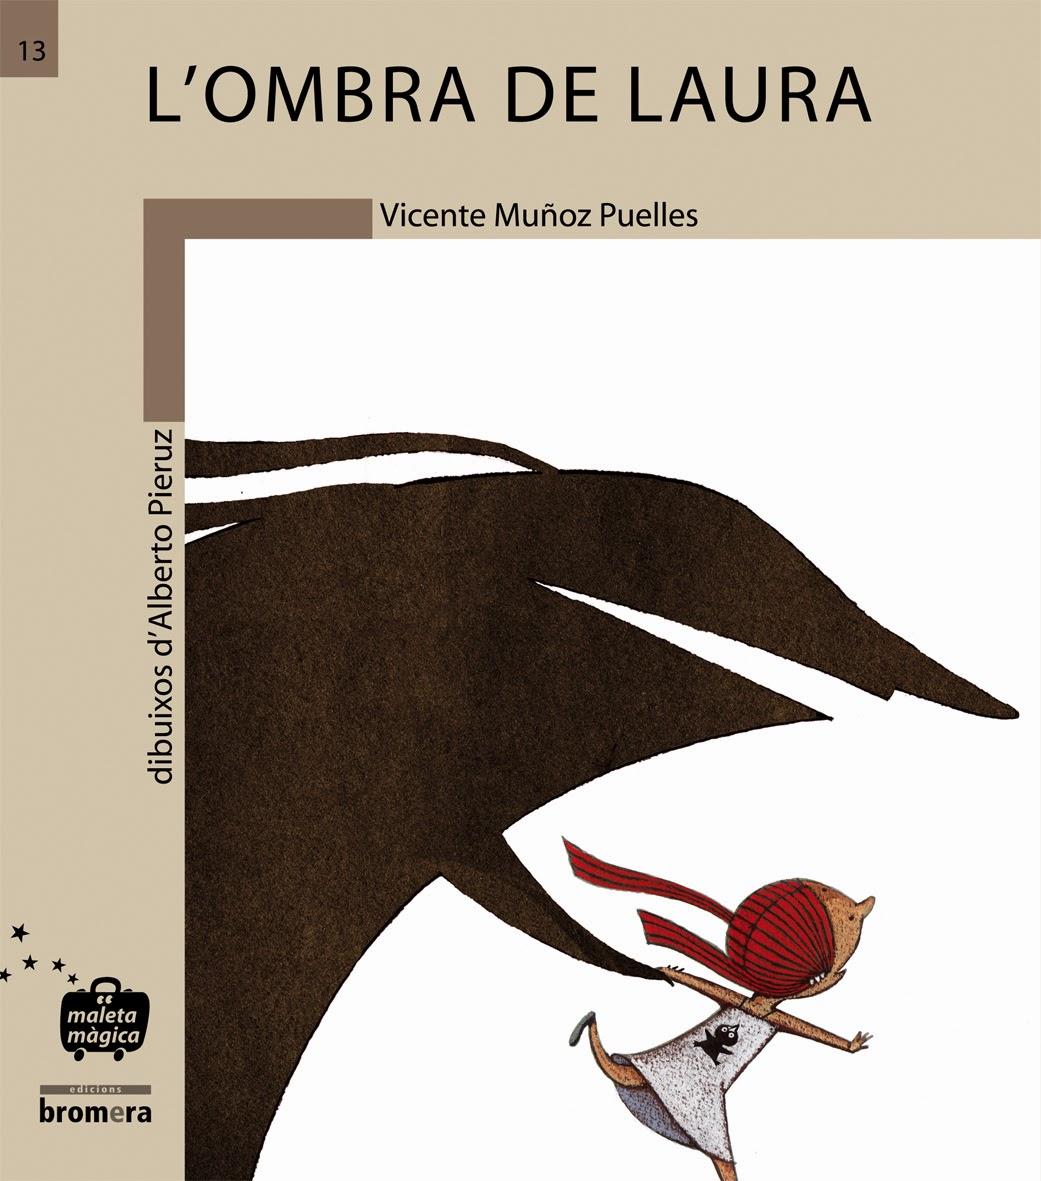 La sombra de Laura